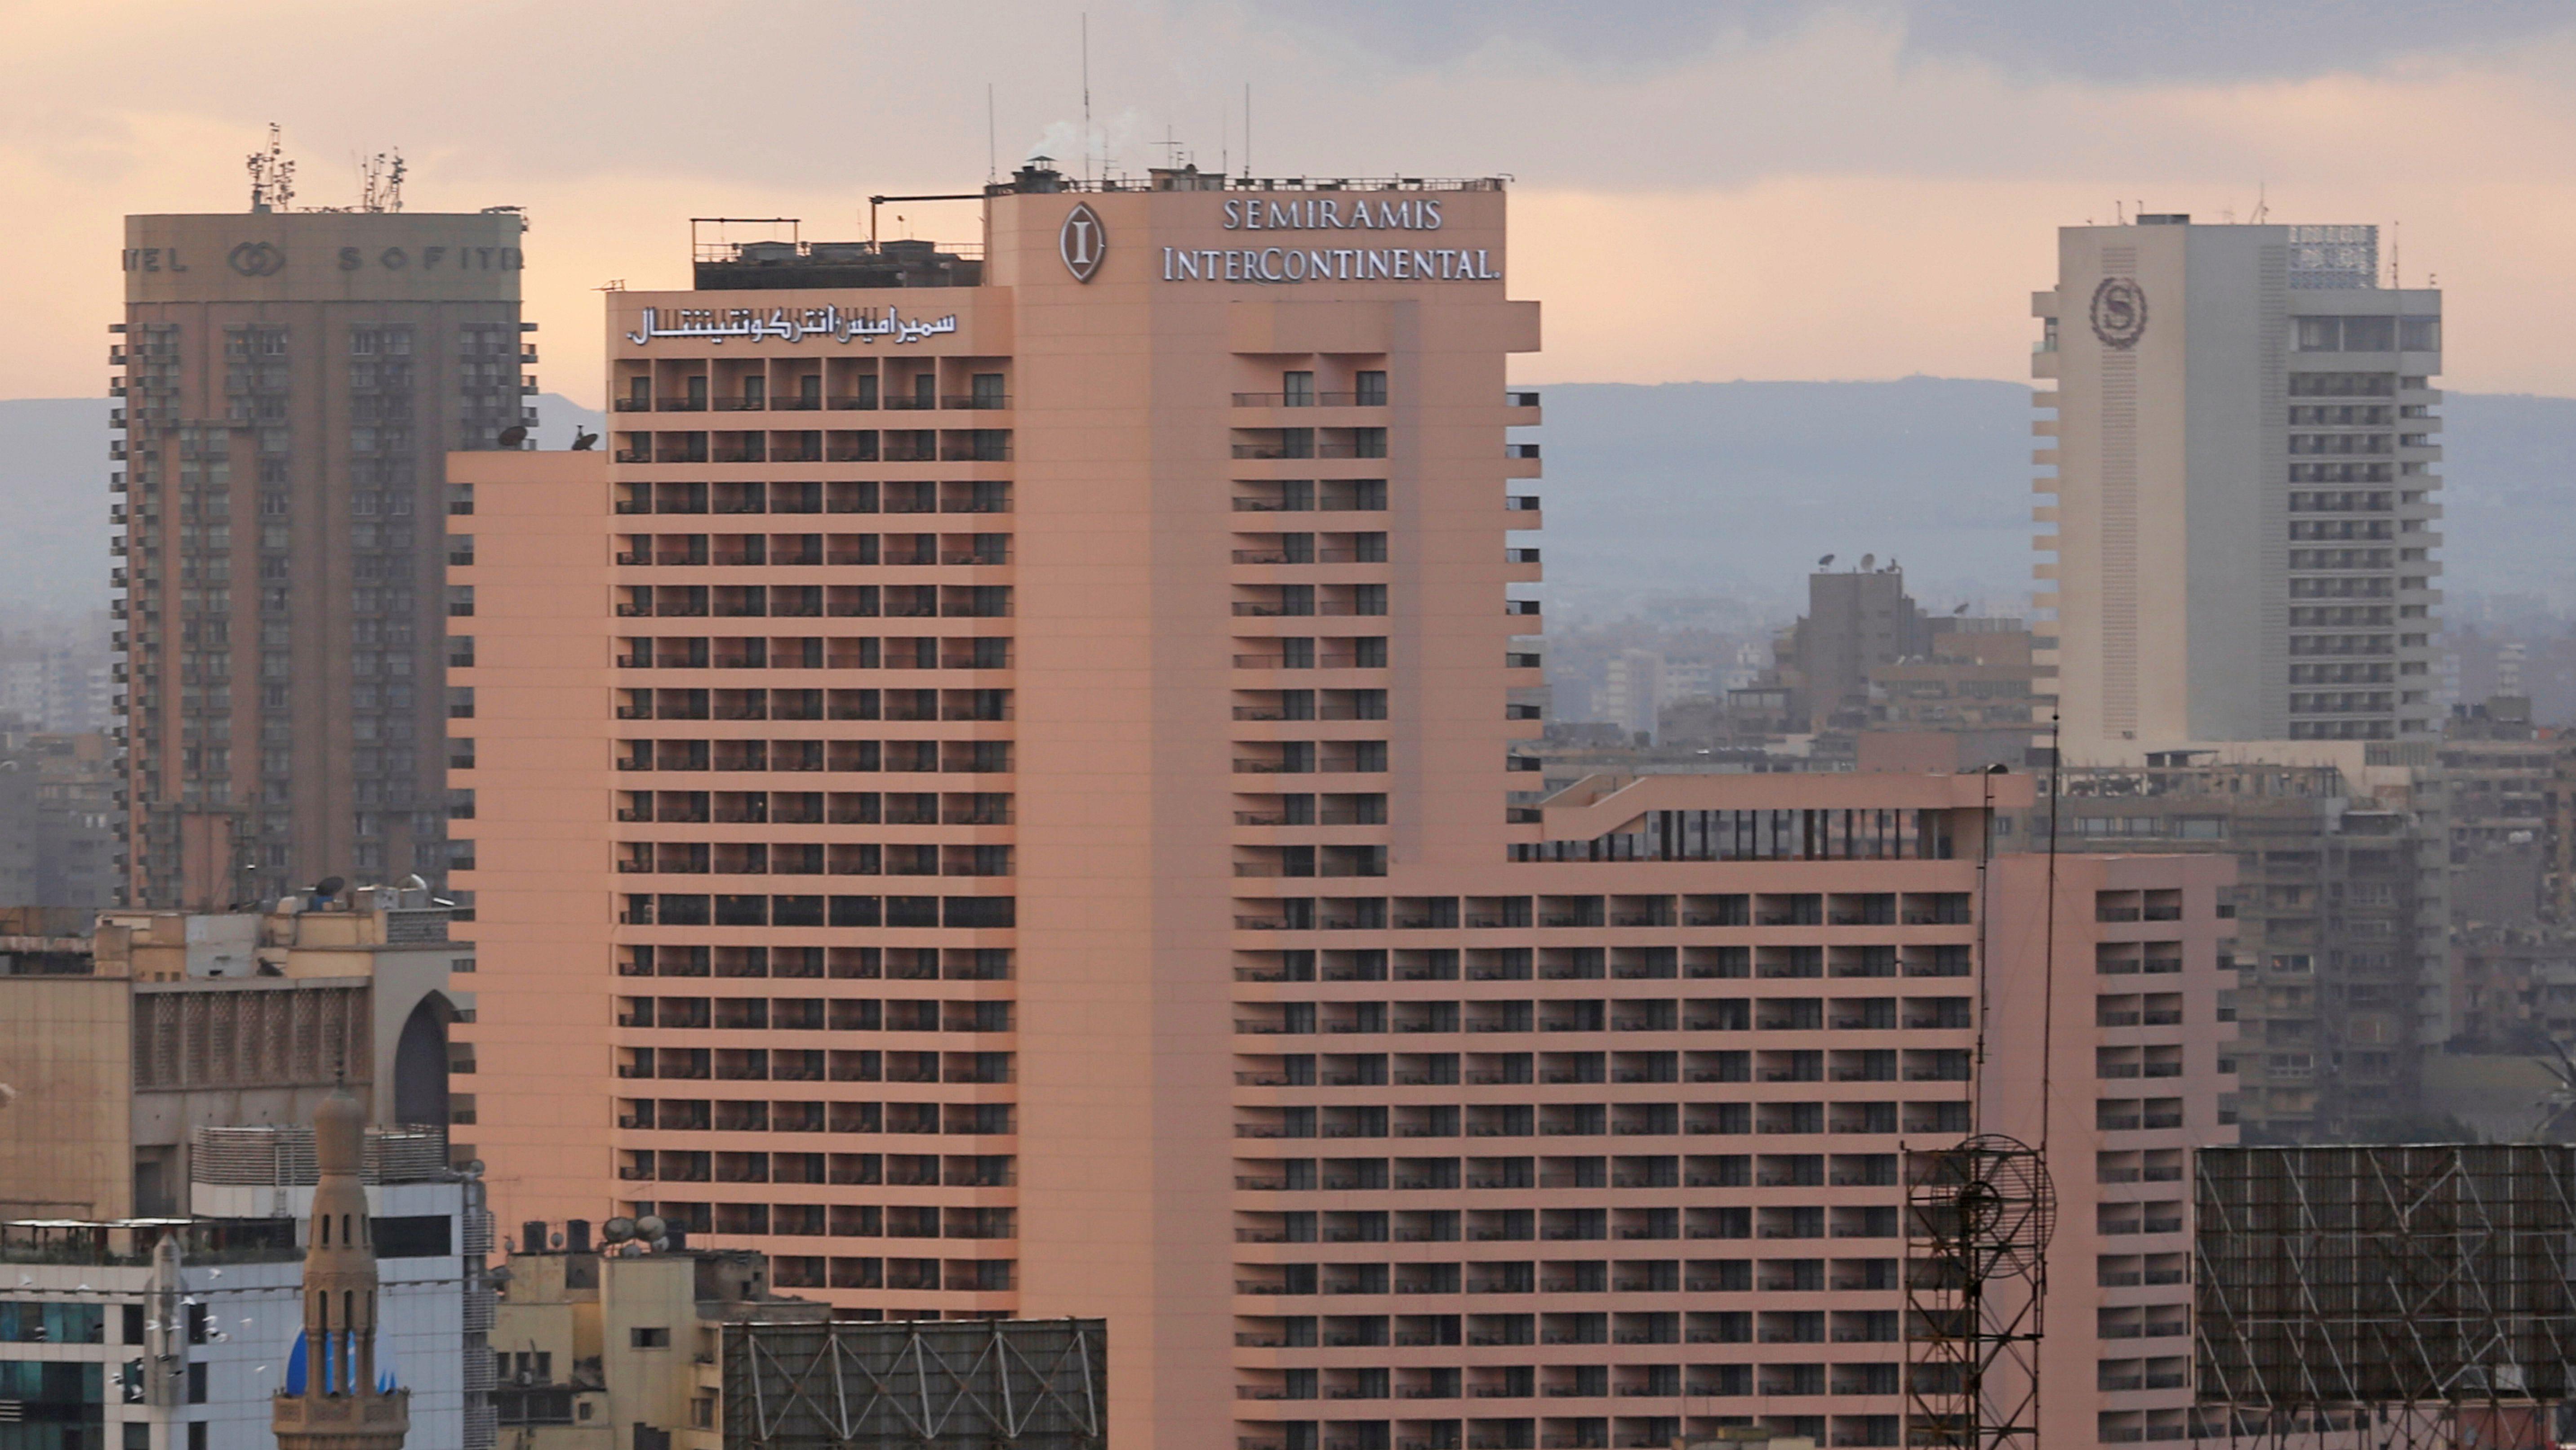 The Semiramis InterContinental Hotel, Sofitel Cairo El Gezirah hotel and Sheraton Cairo Hotel are seen in Cairo, Egypt December 5, 2016.